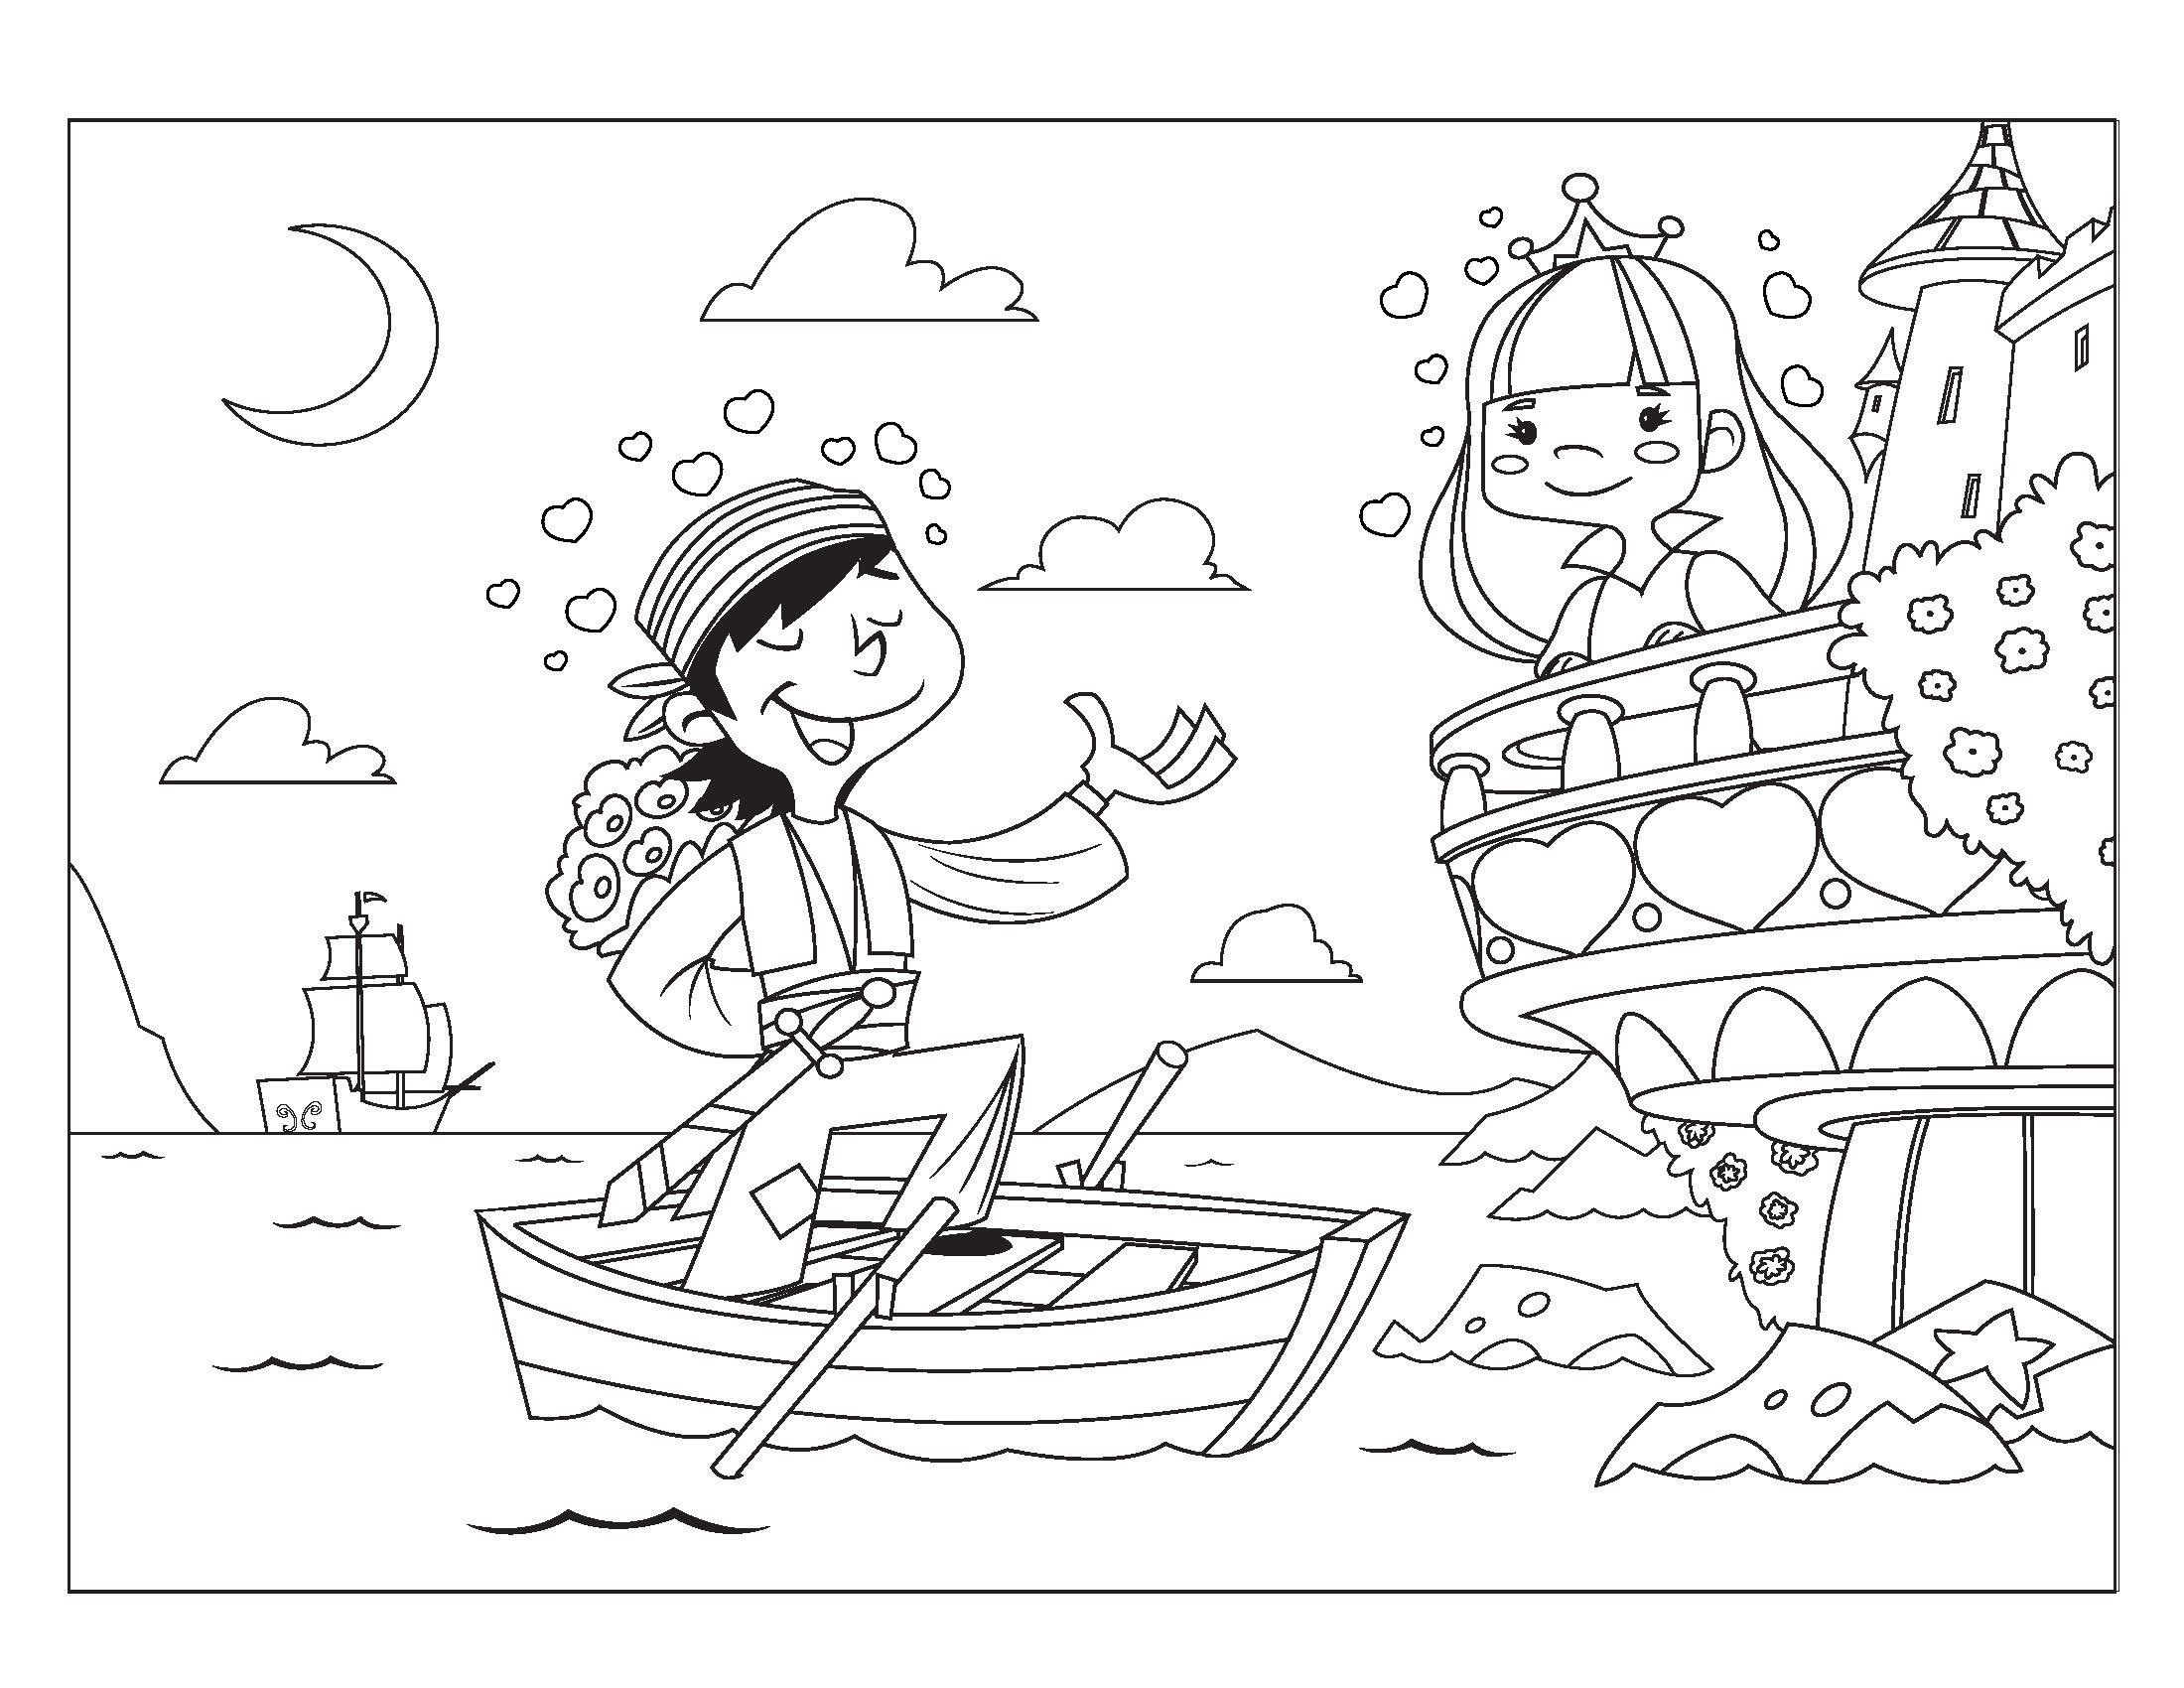 Coloring Page Pirate Princess Jpg 2200 1700 Pirate